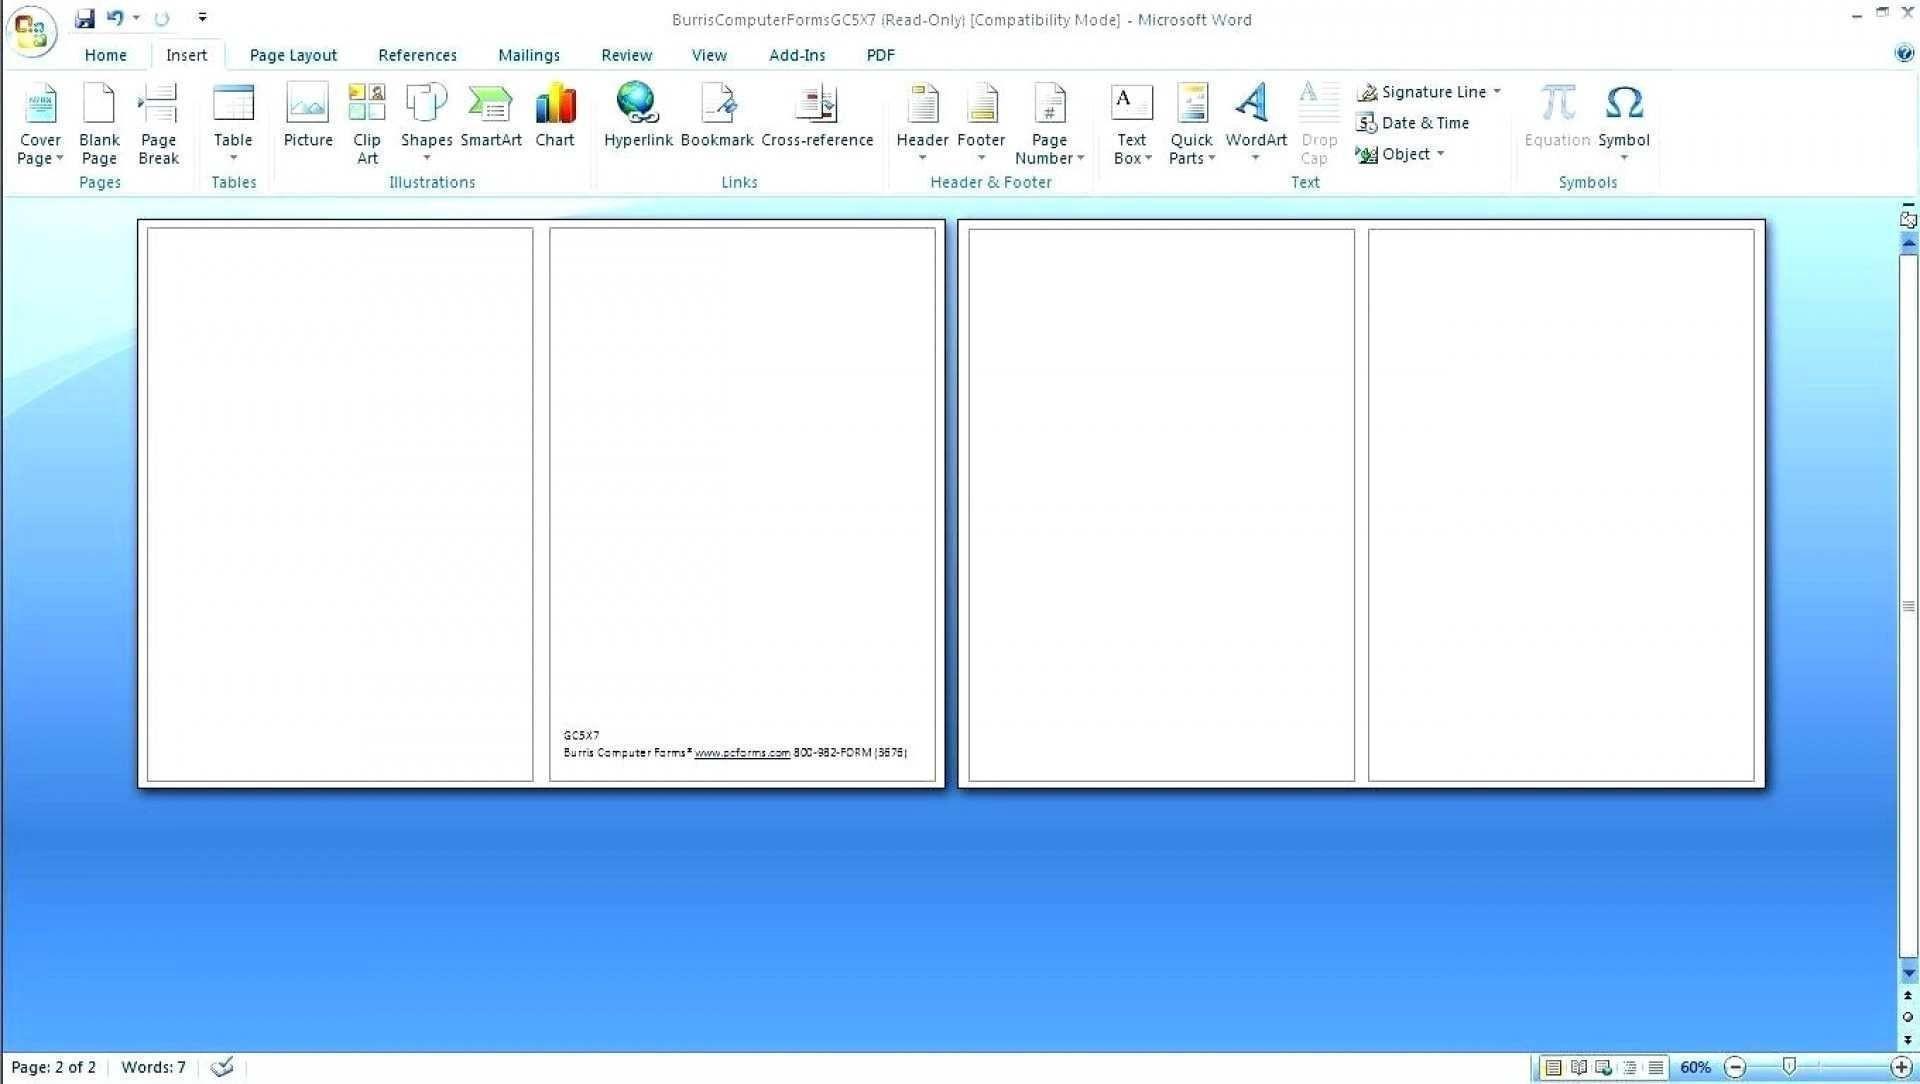 002 Astounding Microsoft Word Card Template Idea  Birthday Download Busines Free1920